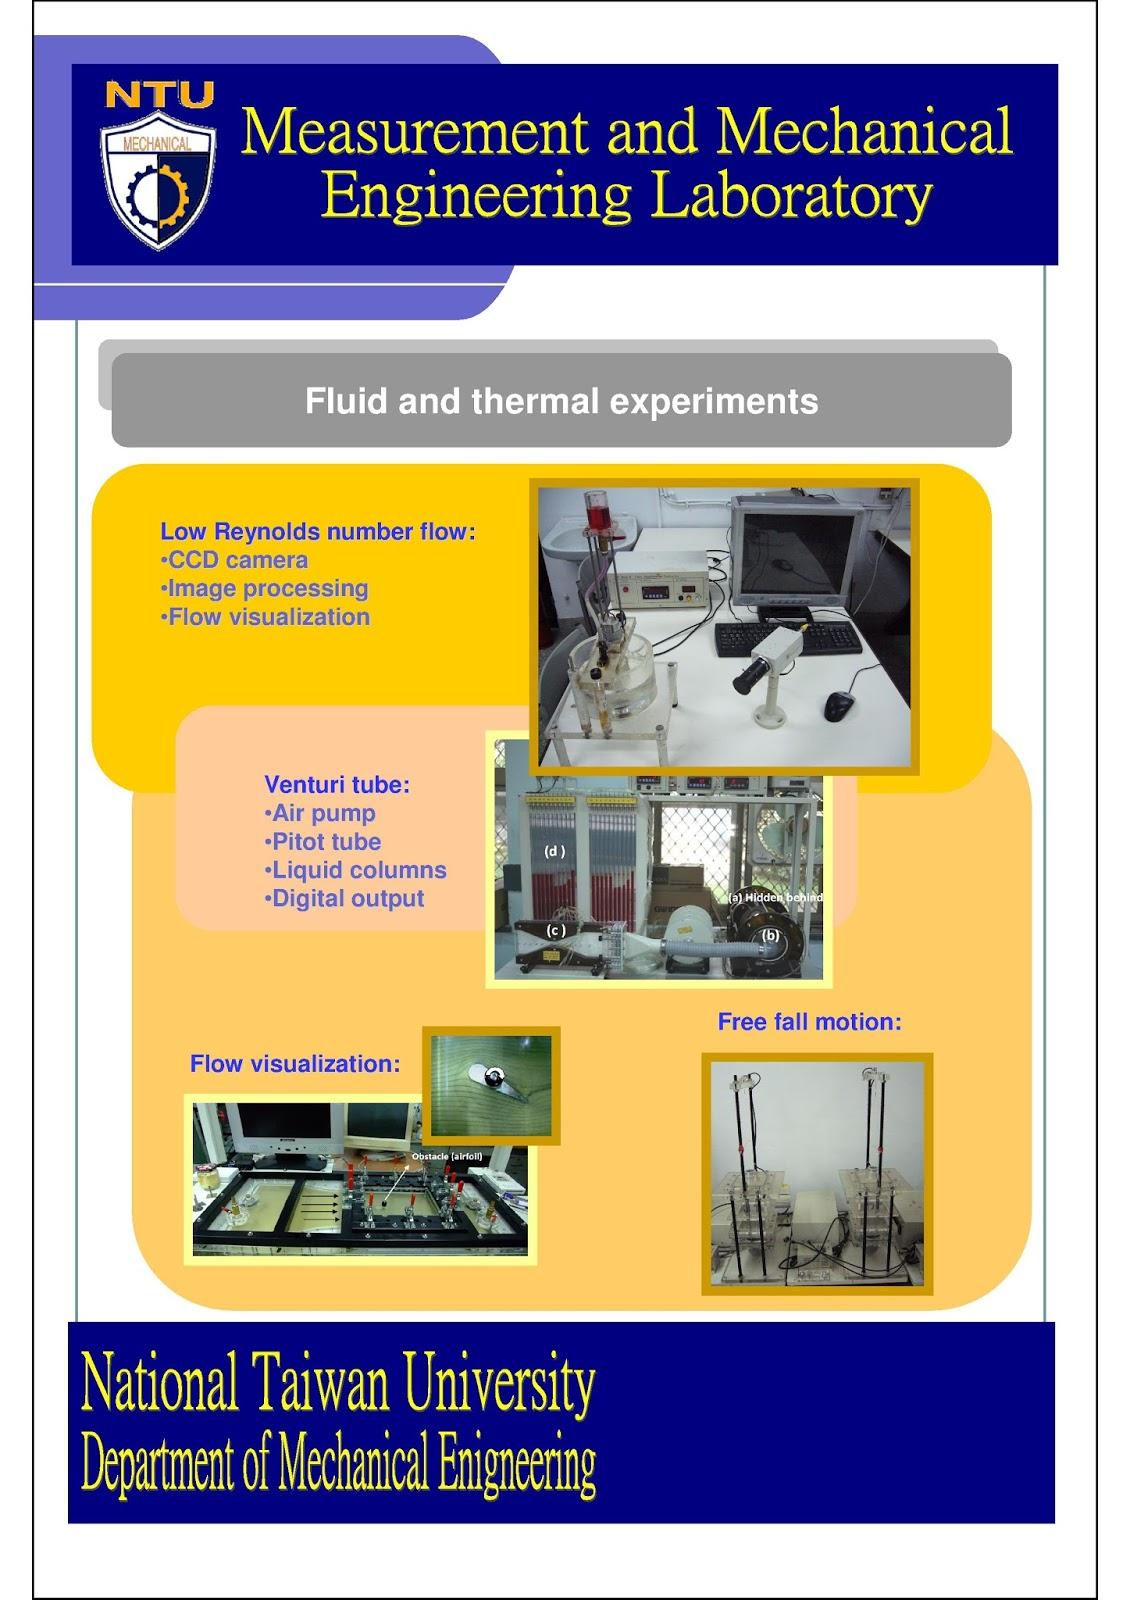 Yu-Hsiu Lee (Martin Lee): Measurement and Mechanical